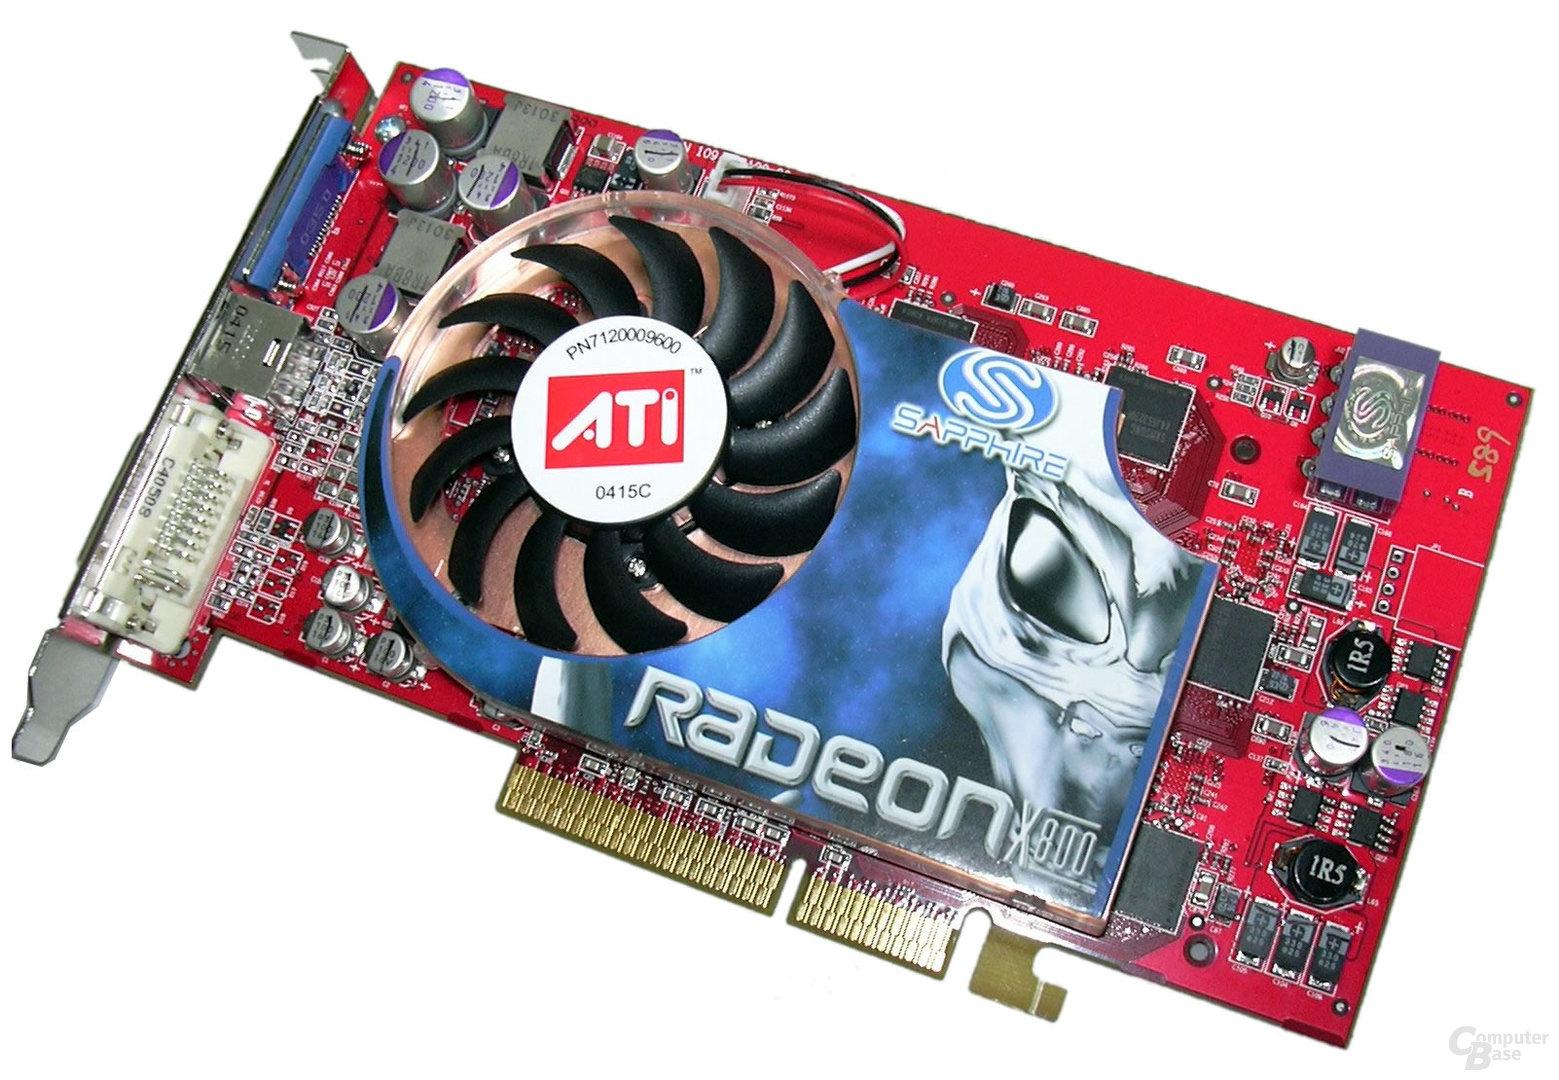 Sapphire Radeon X800 Pro